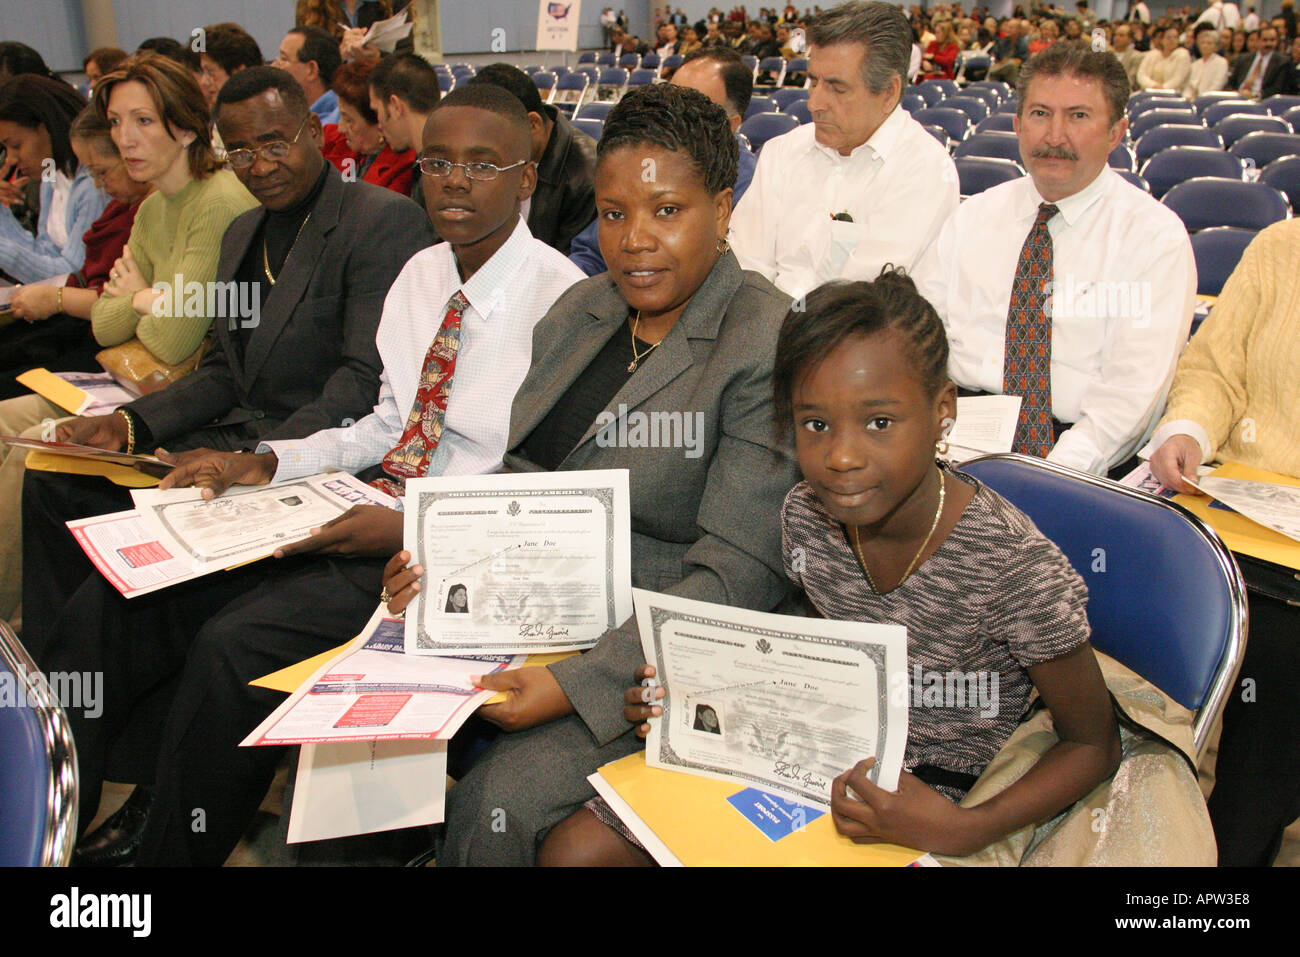 Us Citizenship Ceremony Stock Photos & Us Citizenship